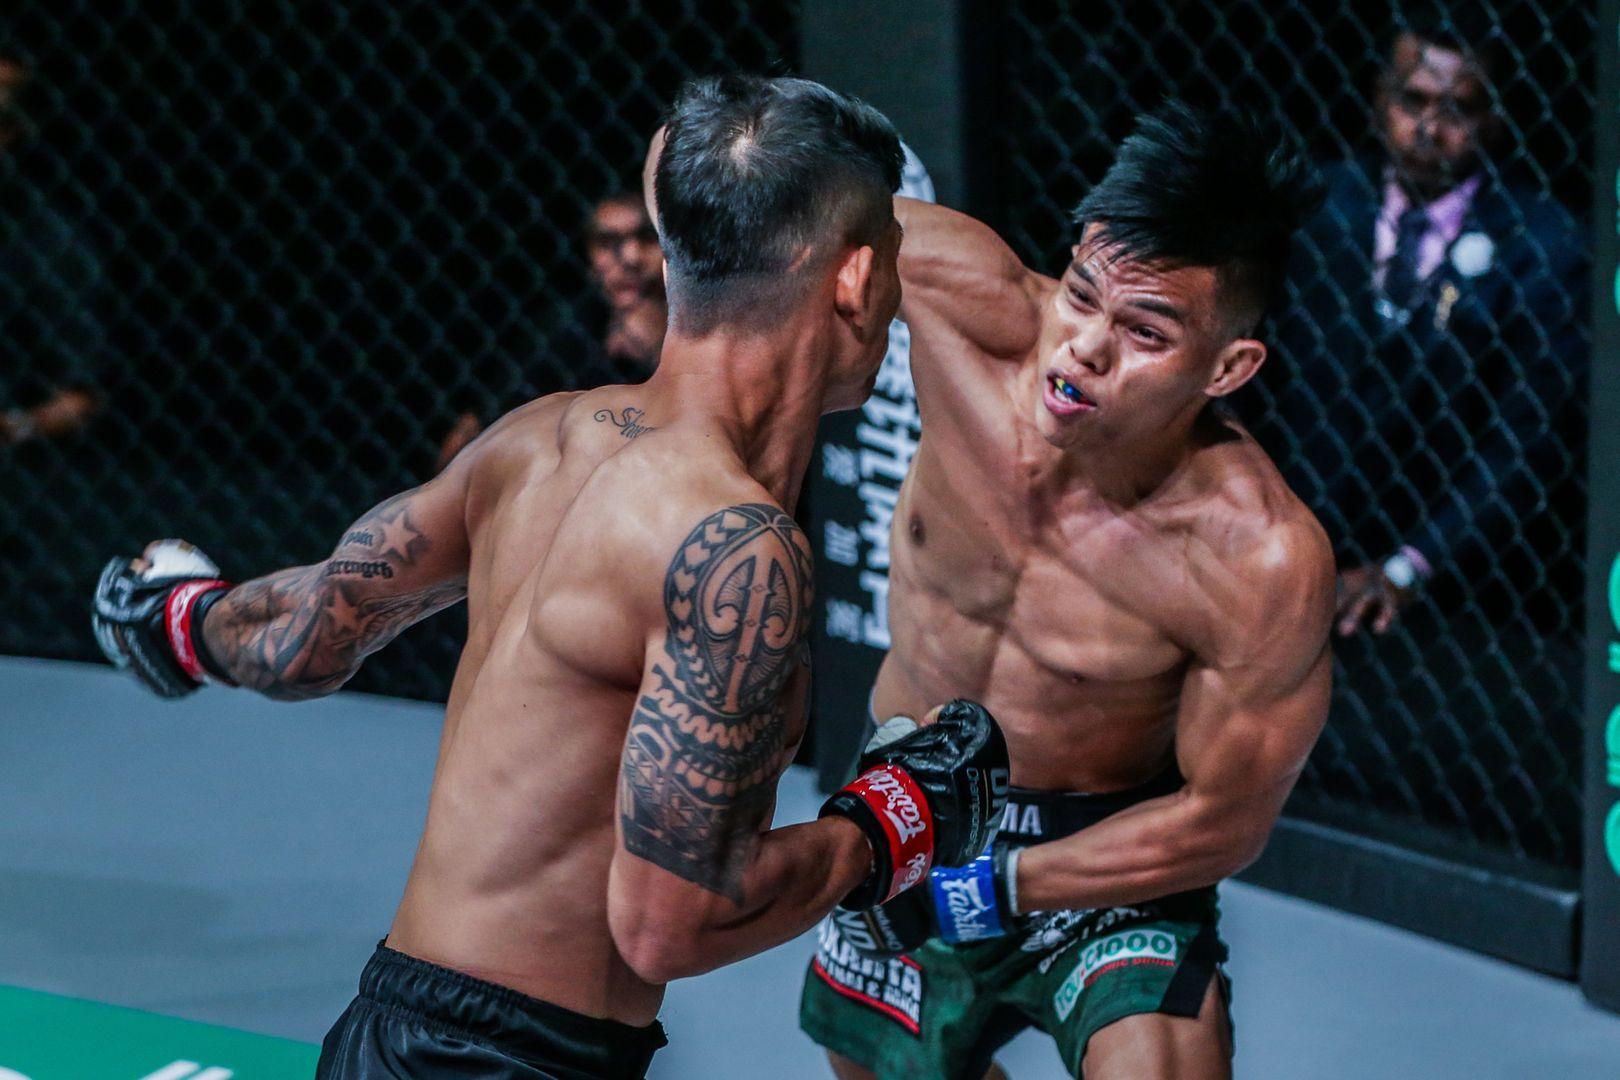 Indonesian wrestling champion Elipitua Siregar shows off his striking in Jakarta, Indonesia in October 2019